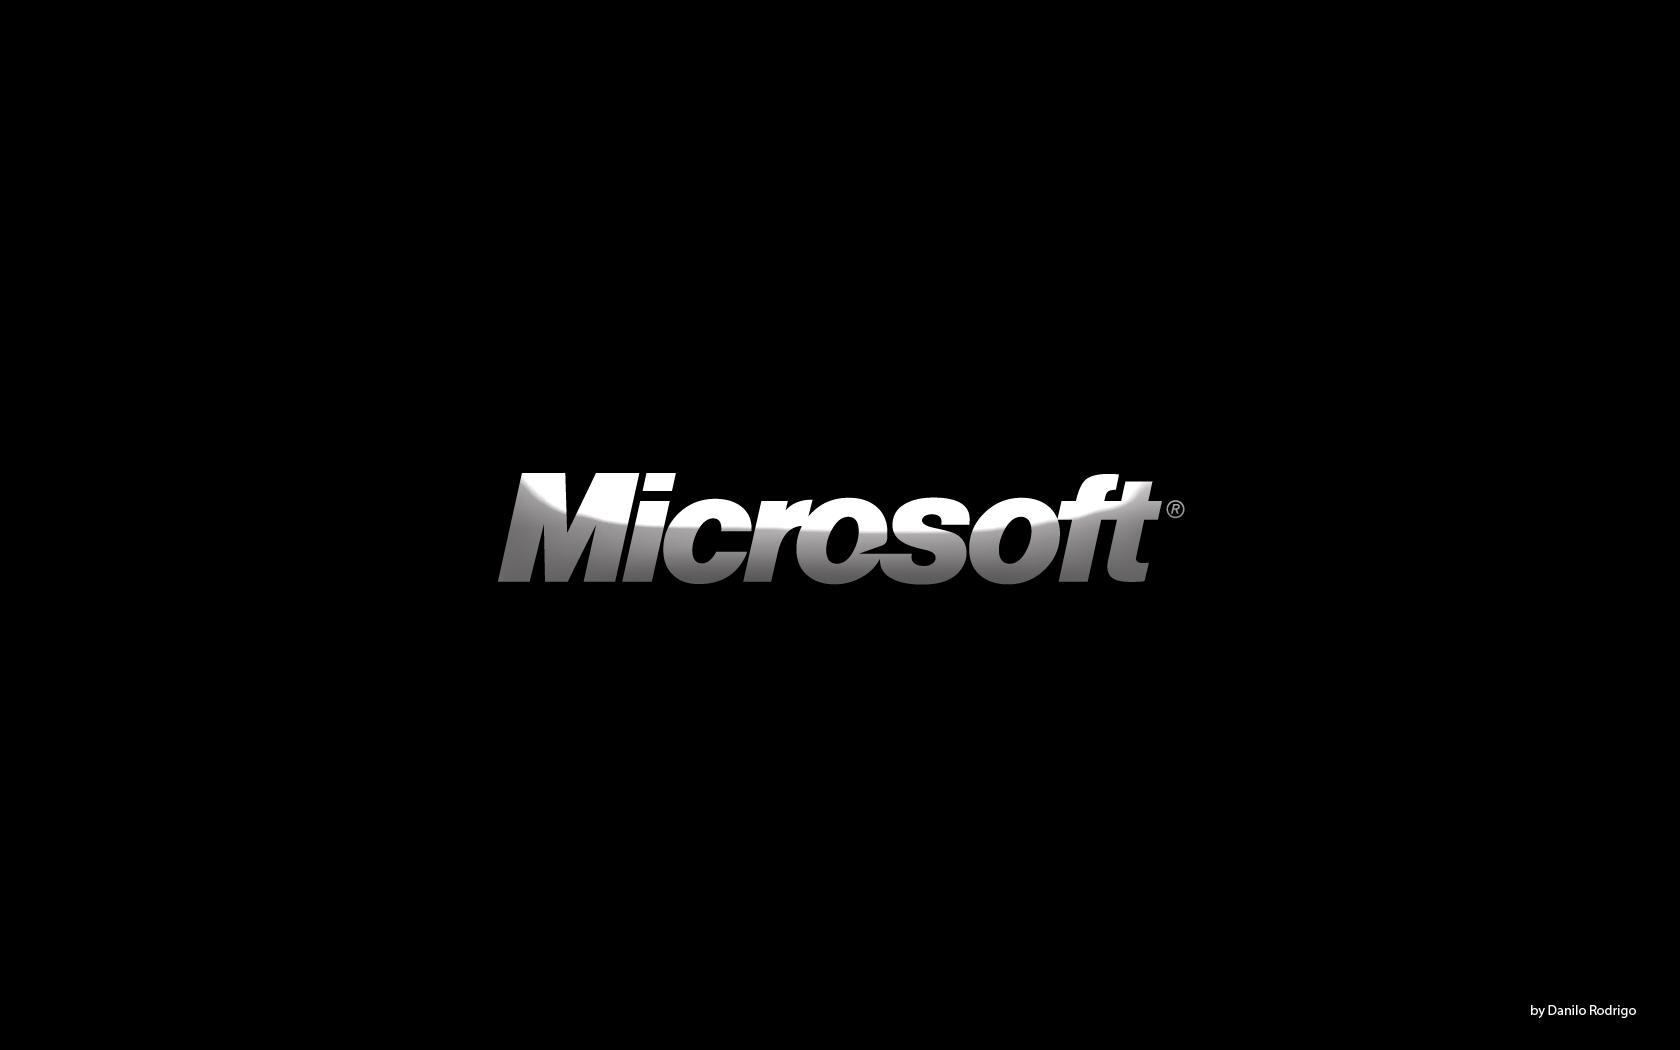 Microsoft Desktop Backgrounds 1680x1050